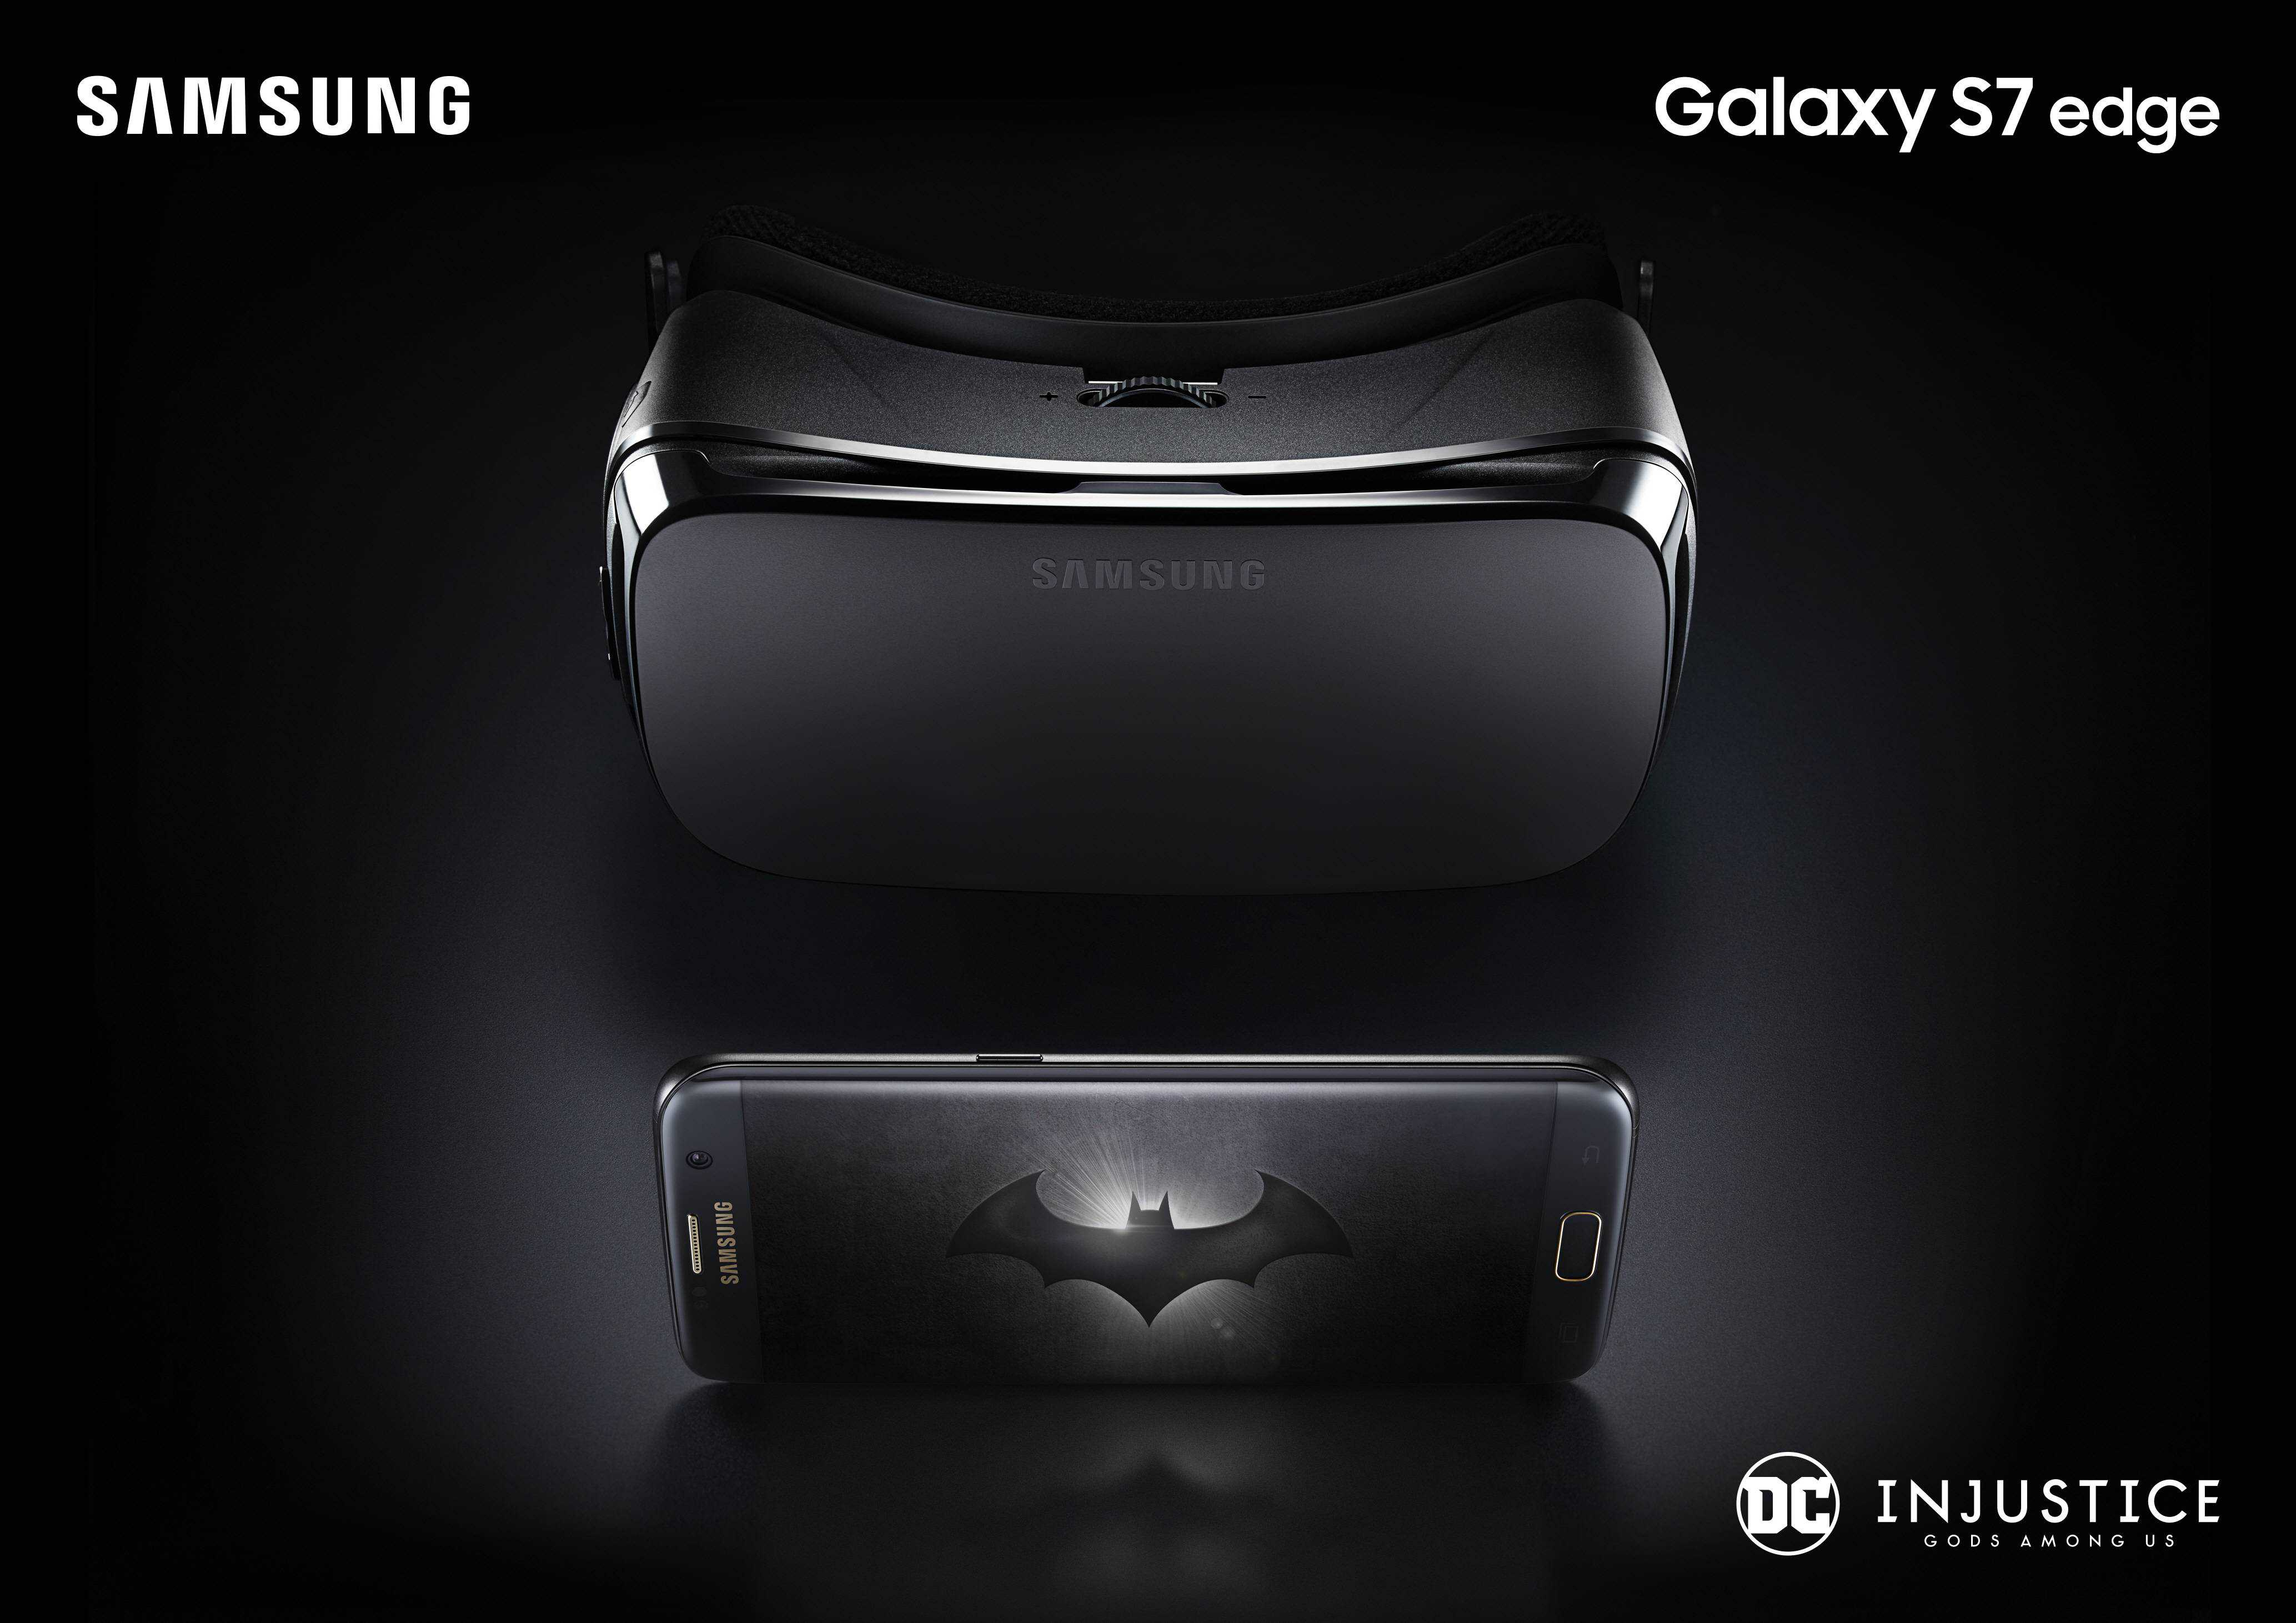 Samsung Galaxy S7 Edge Injustice Edition 5